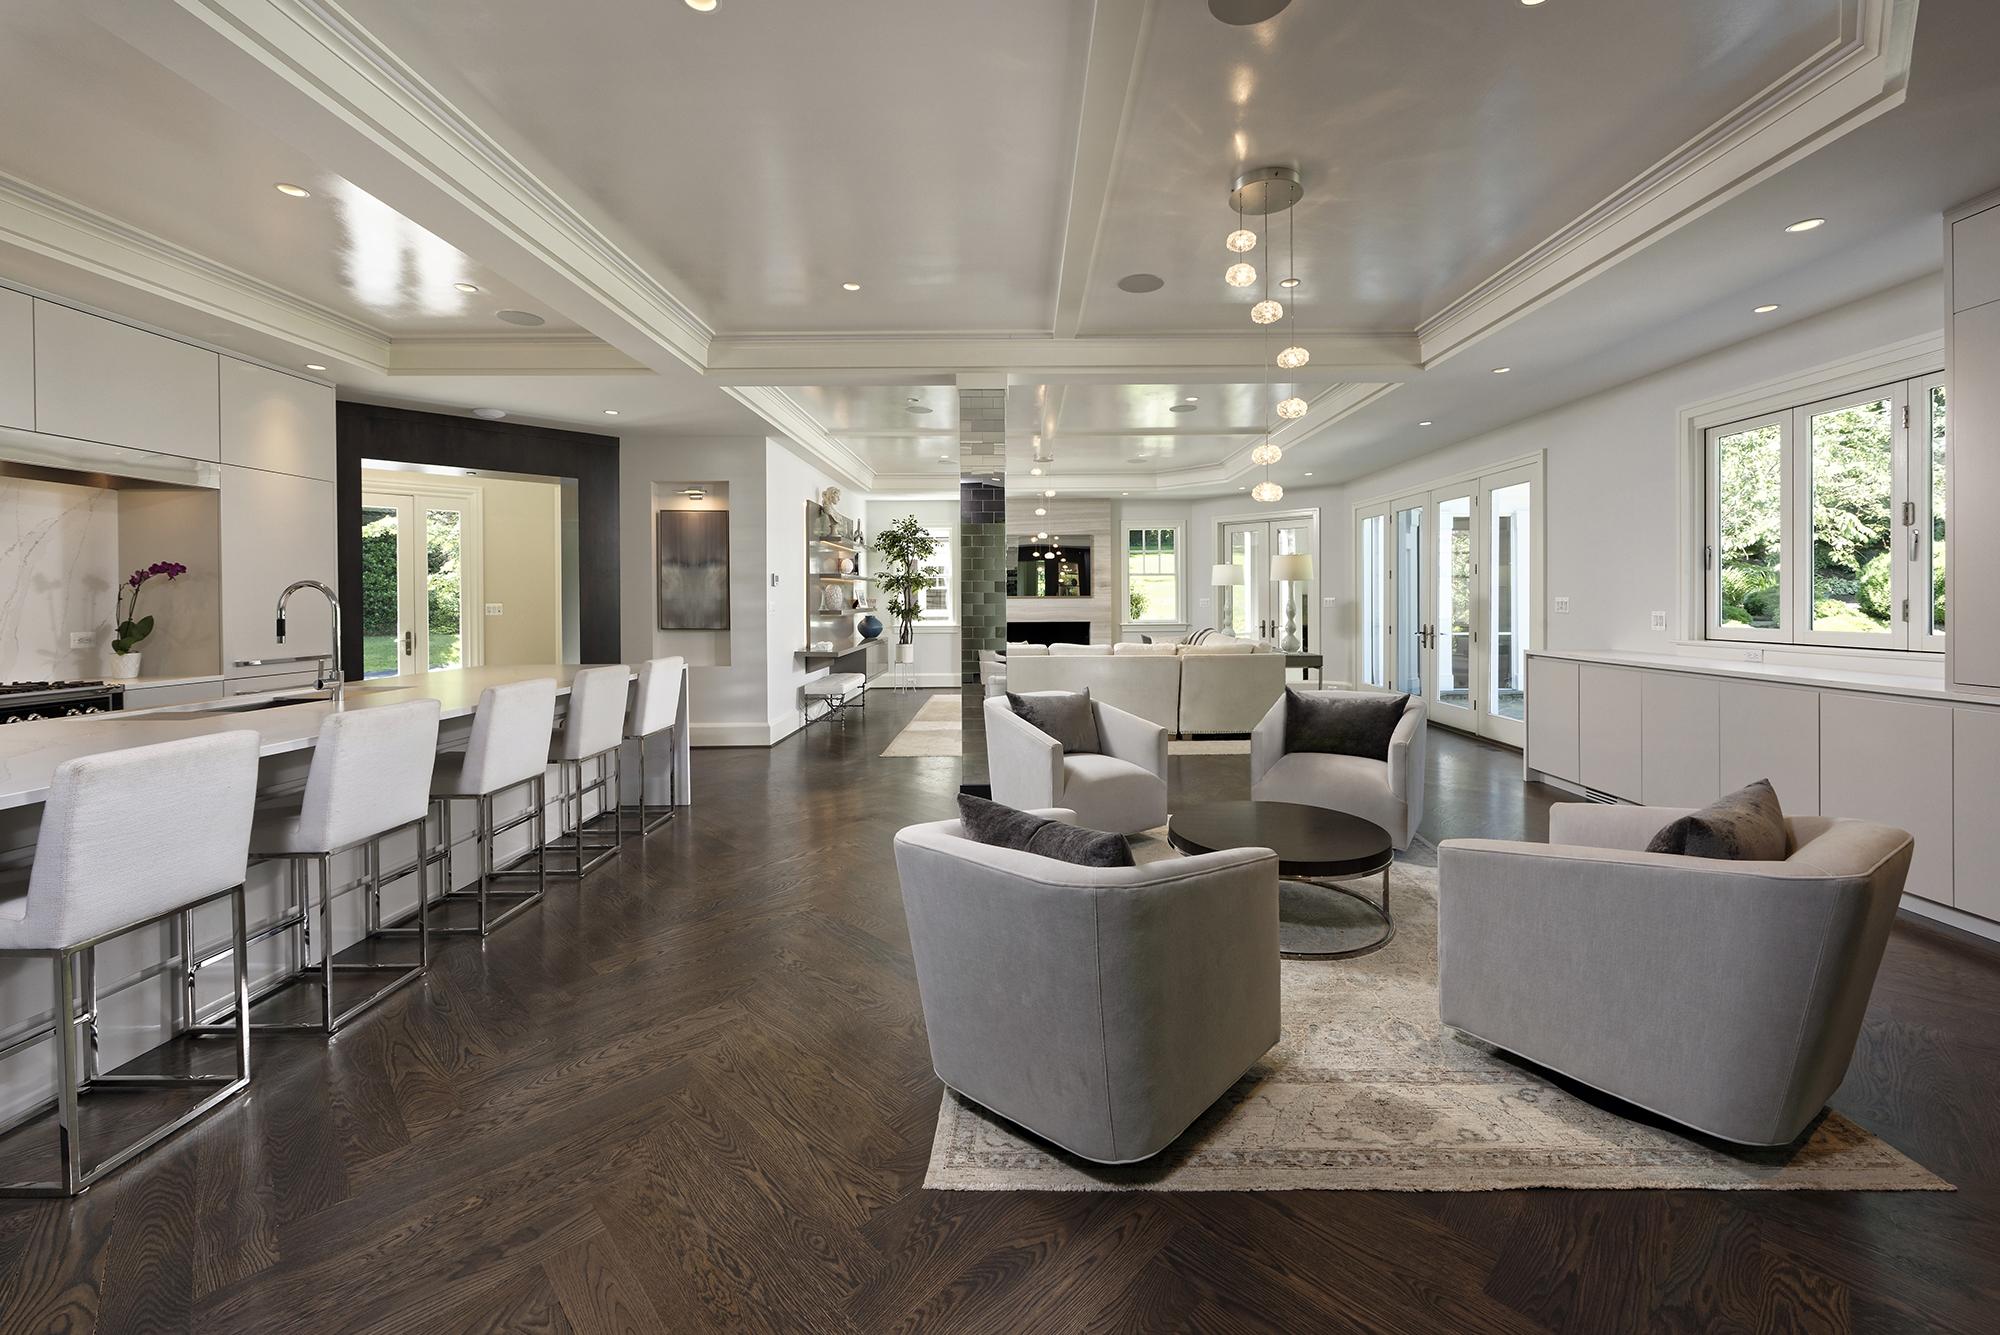 Modern Luxury Kitchen Master Bath And Basement Remodel In